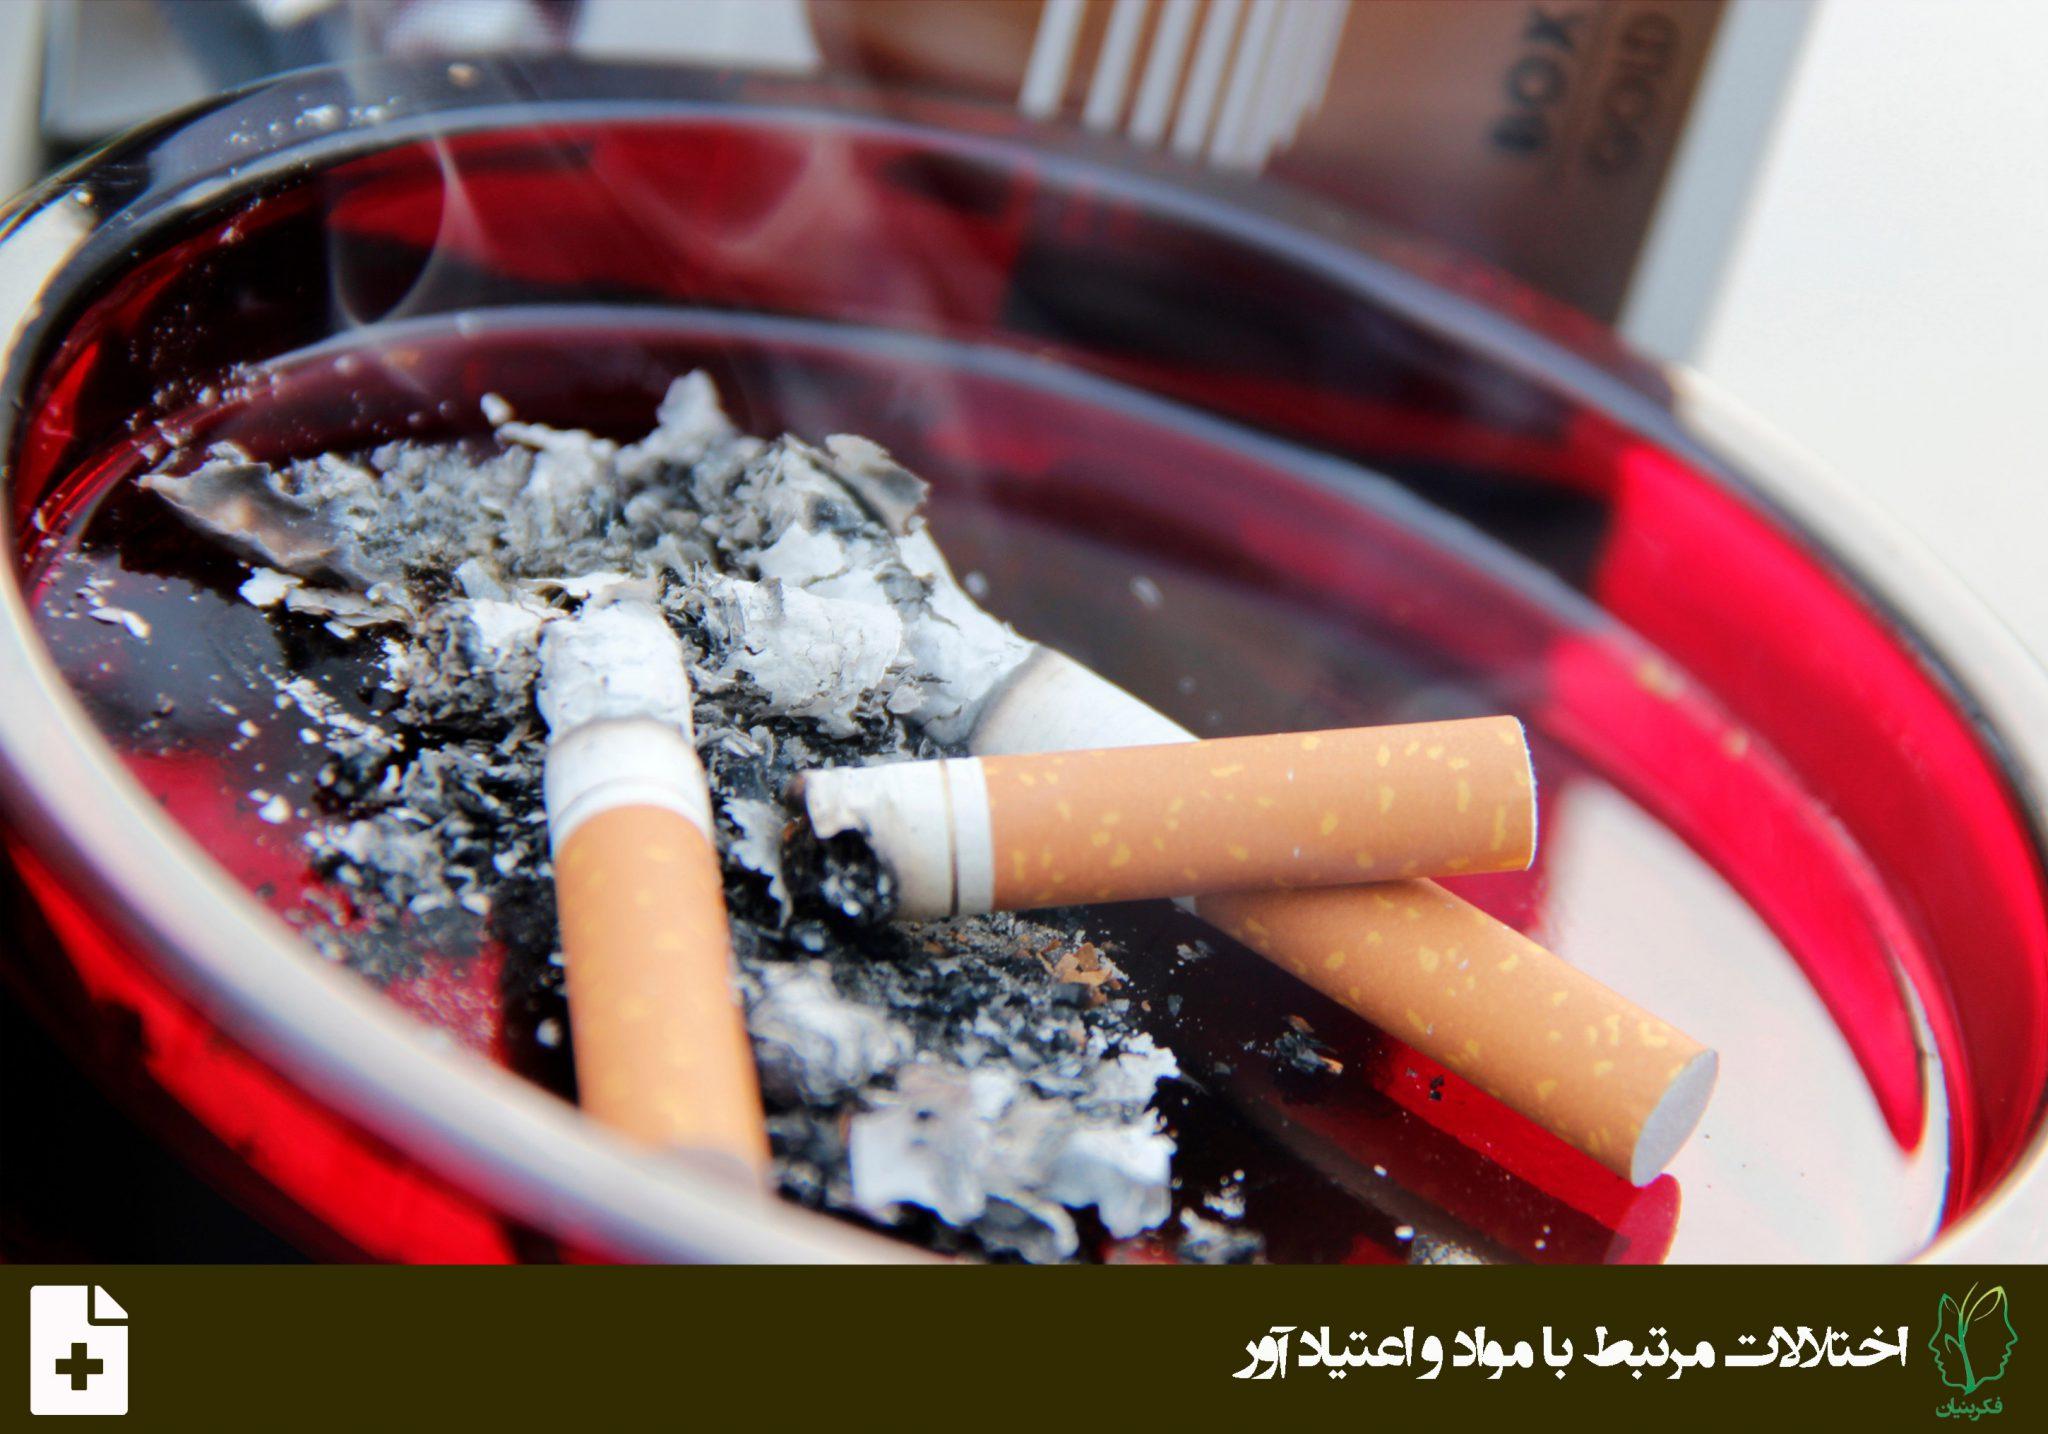 اختلال مرتبط با توتون (Tobacco-related disorder)